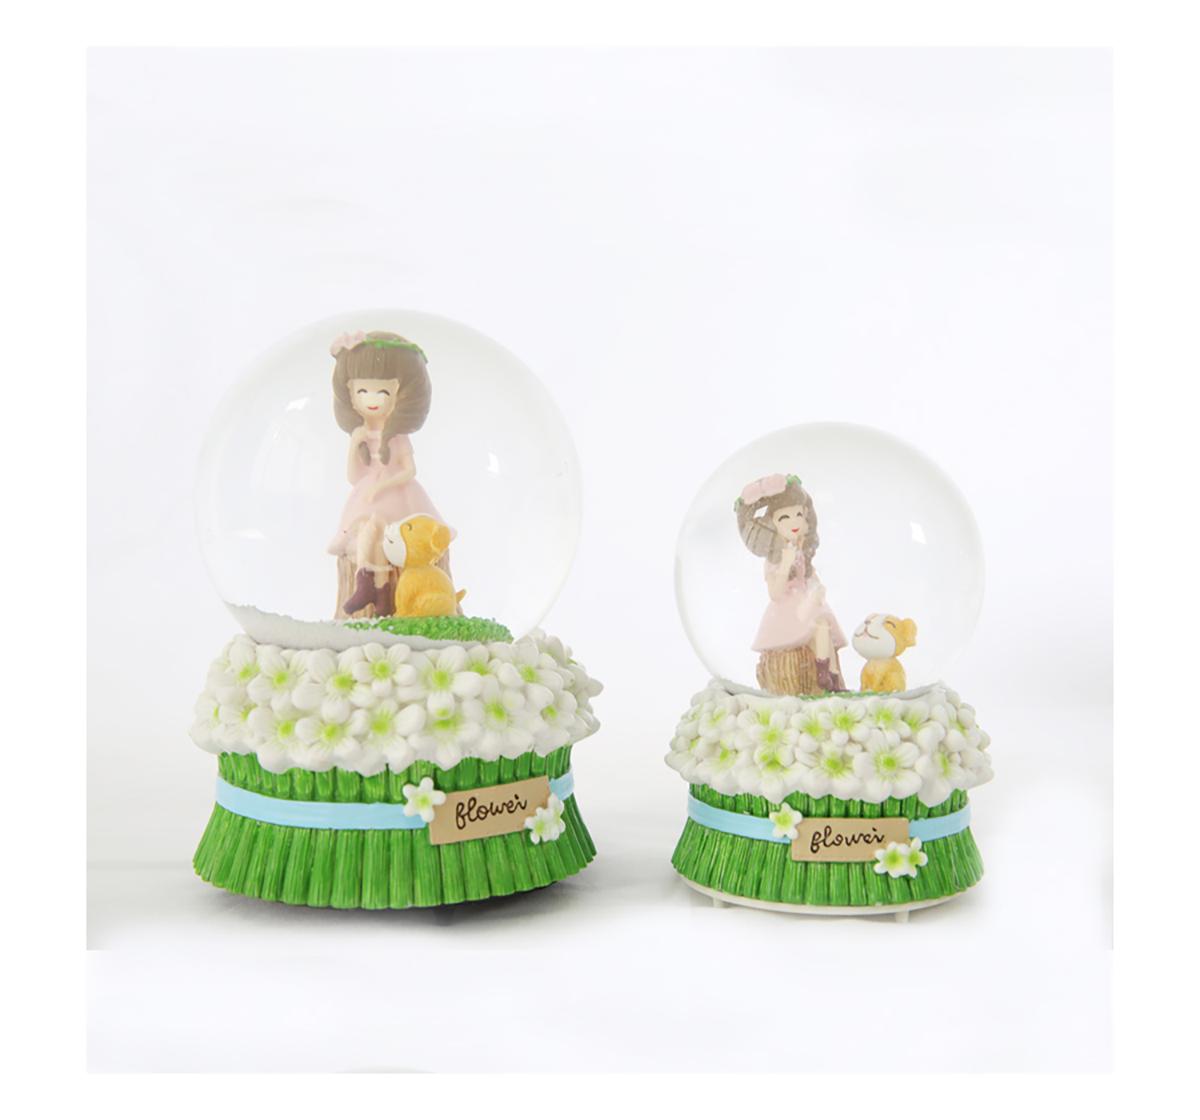 Karma   Karma Flower Girl Snowglobe 100Mm Impulse Toys for Kids age 7Y+ (Pink)